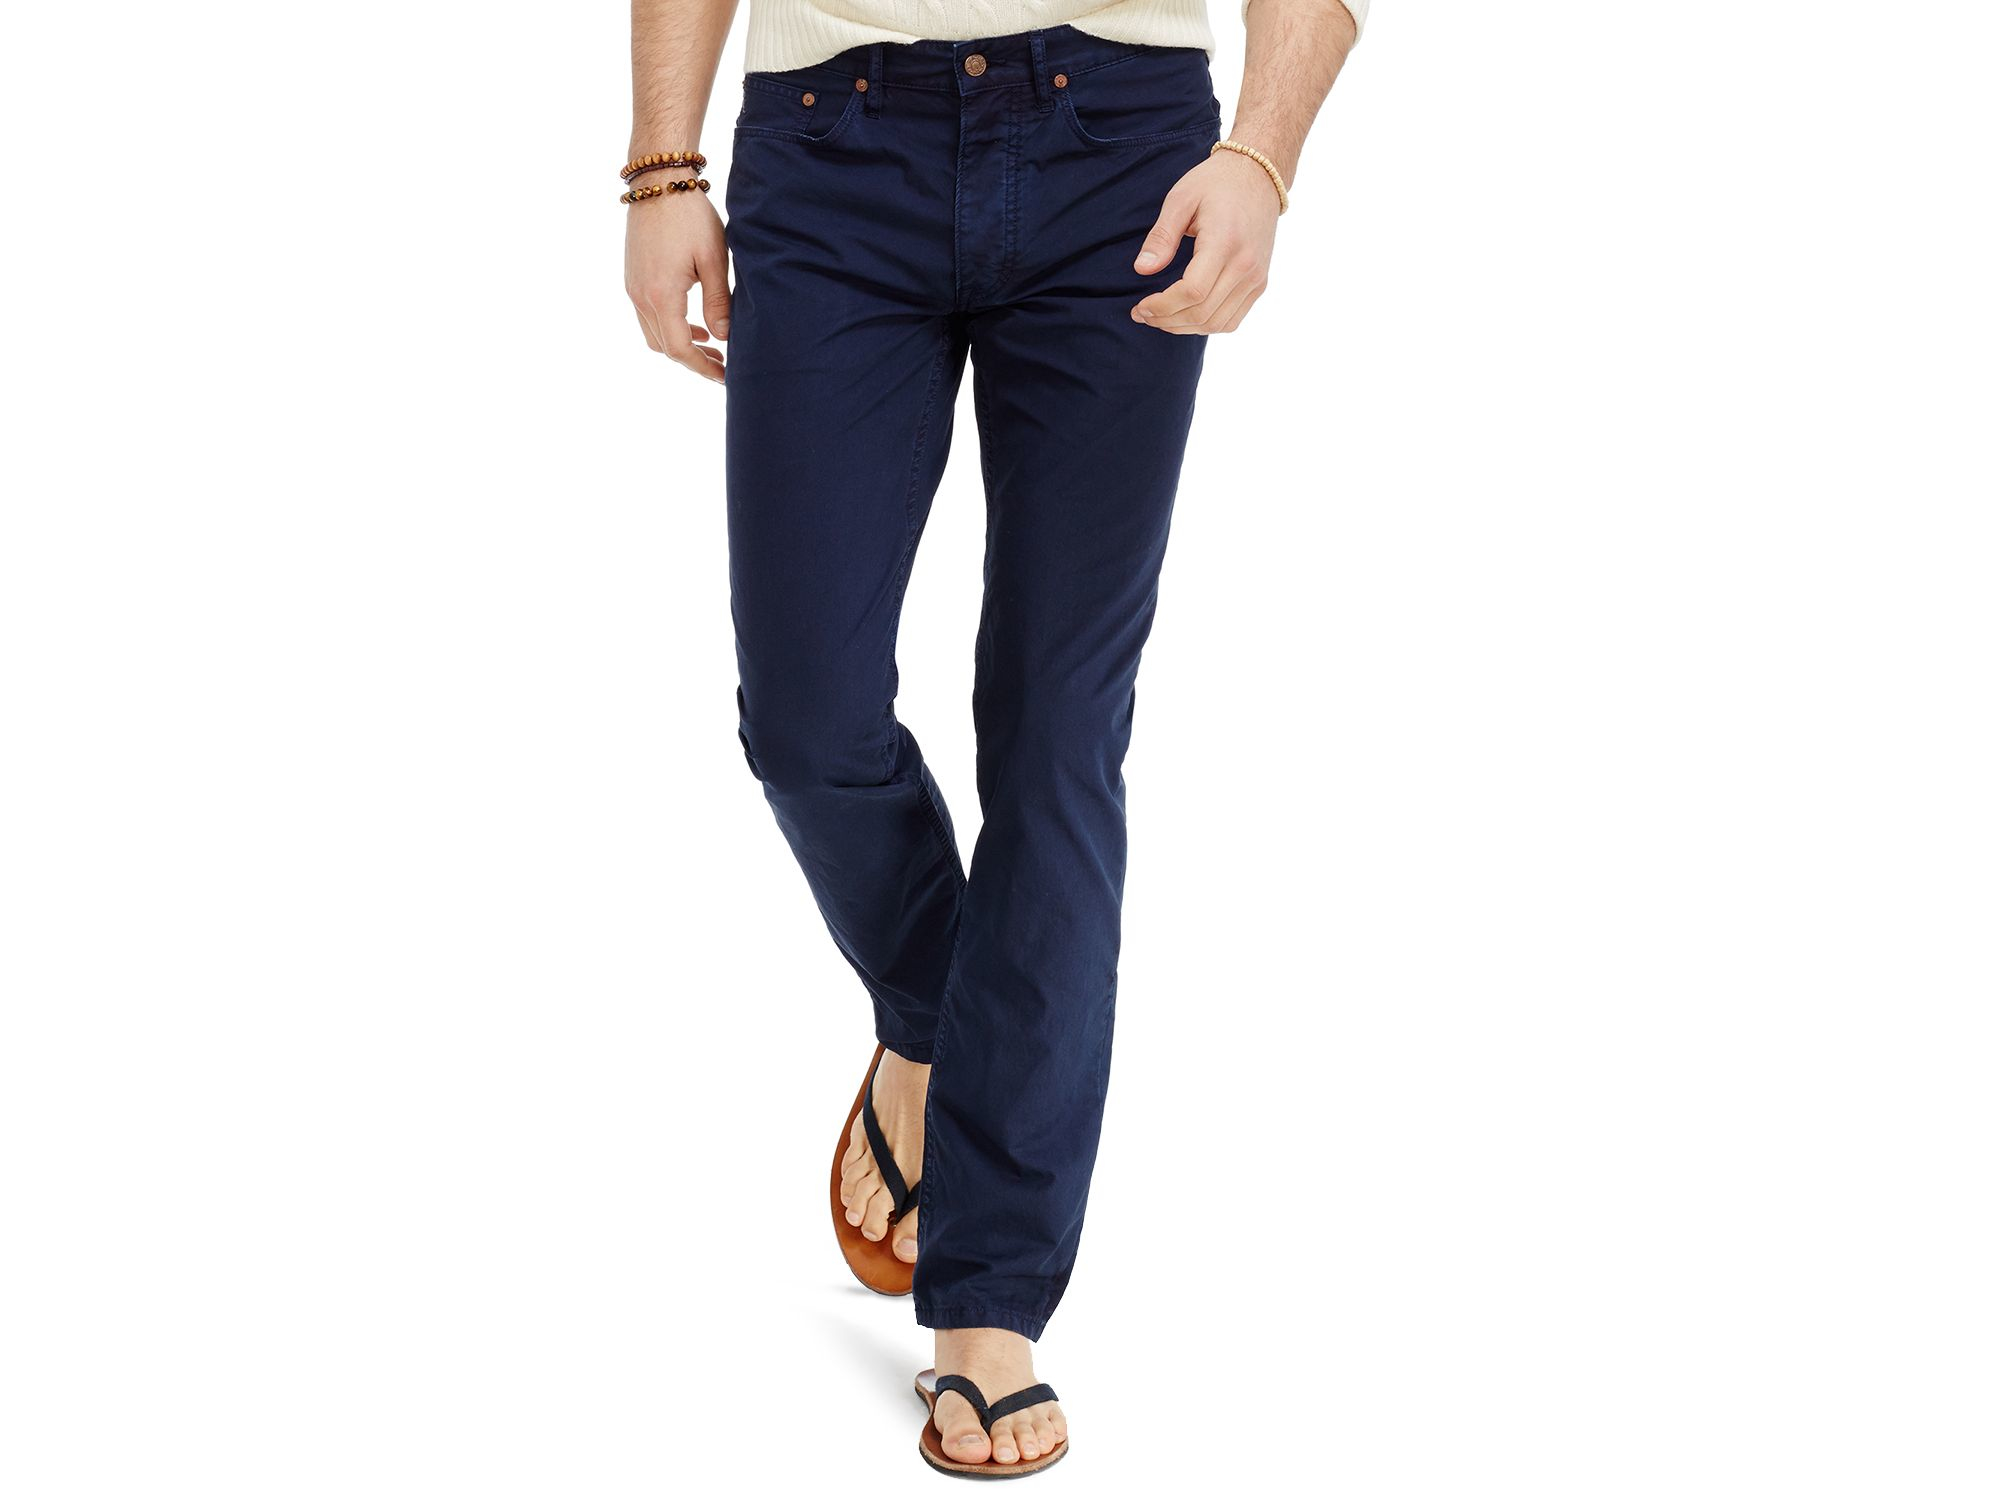 d2cea49e Polo Ralph Lauren Mens Varick Slim Straight Stretch Jeans | Toffee Art